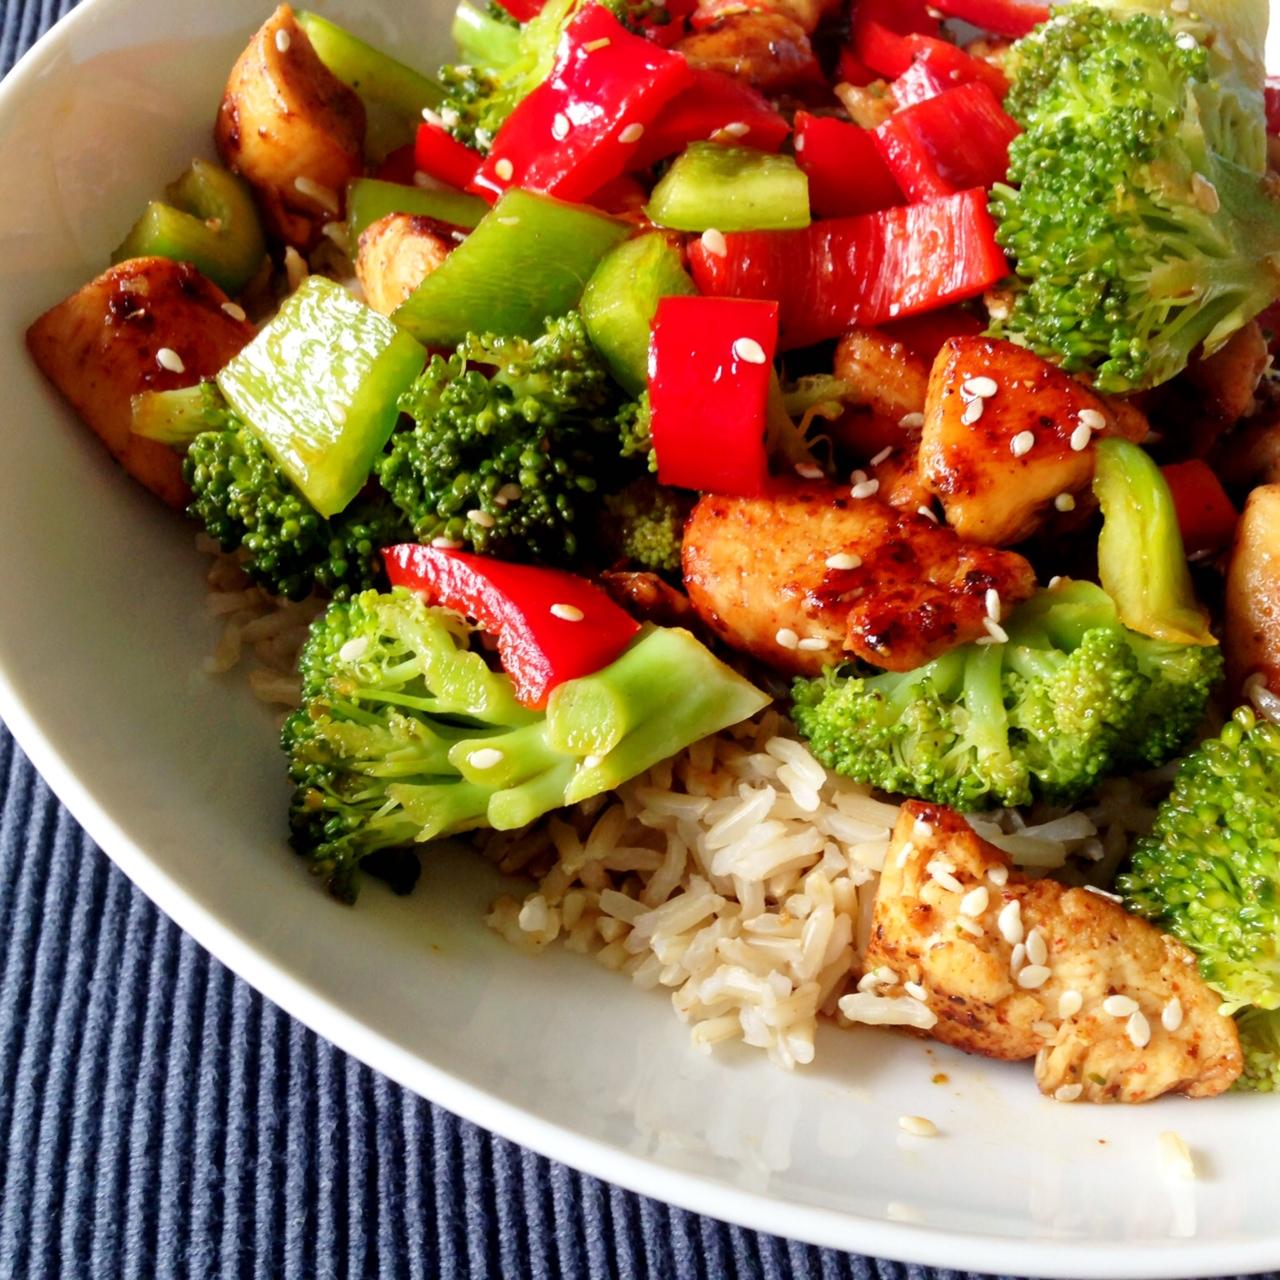 Healthy Dinner Recipe Diet Dinner Idea: Healthy Living In Heels: Dinner Recipe: Sesame Chicken